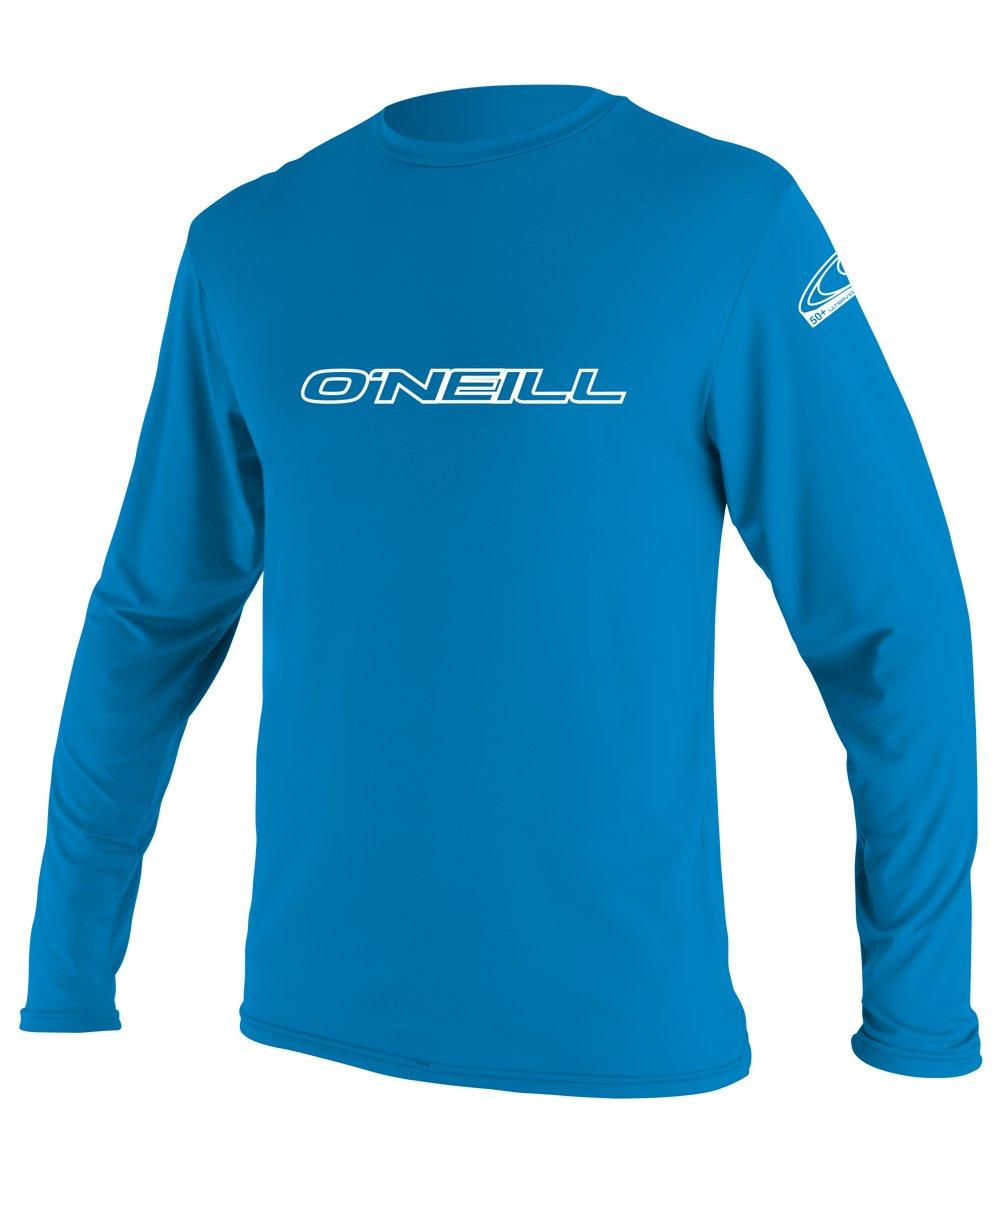 O'Neill Youth Basic Skins UPF 50+ Long Sleeve Sun Shirt, Bright Blue, 16 by O'Neill Wetsuits